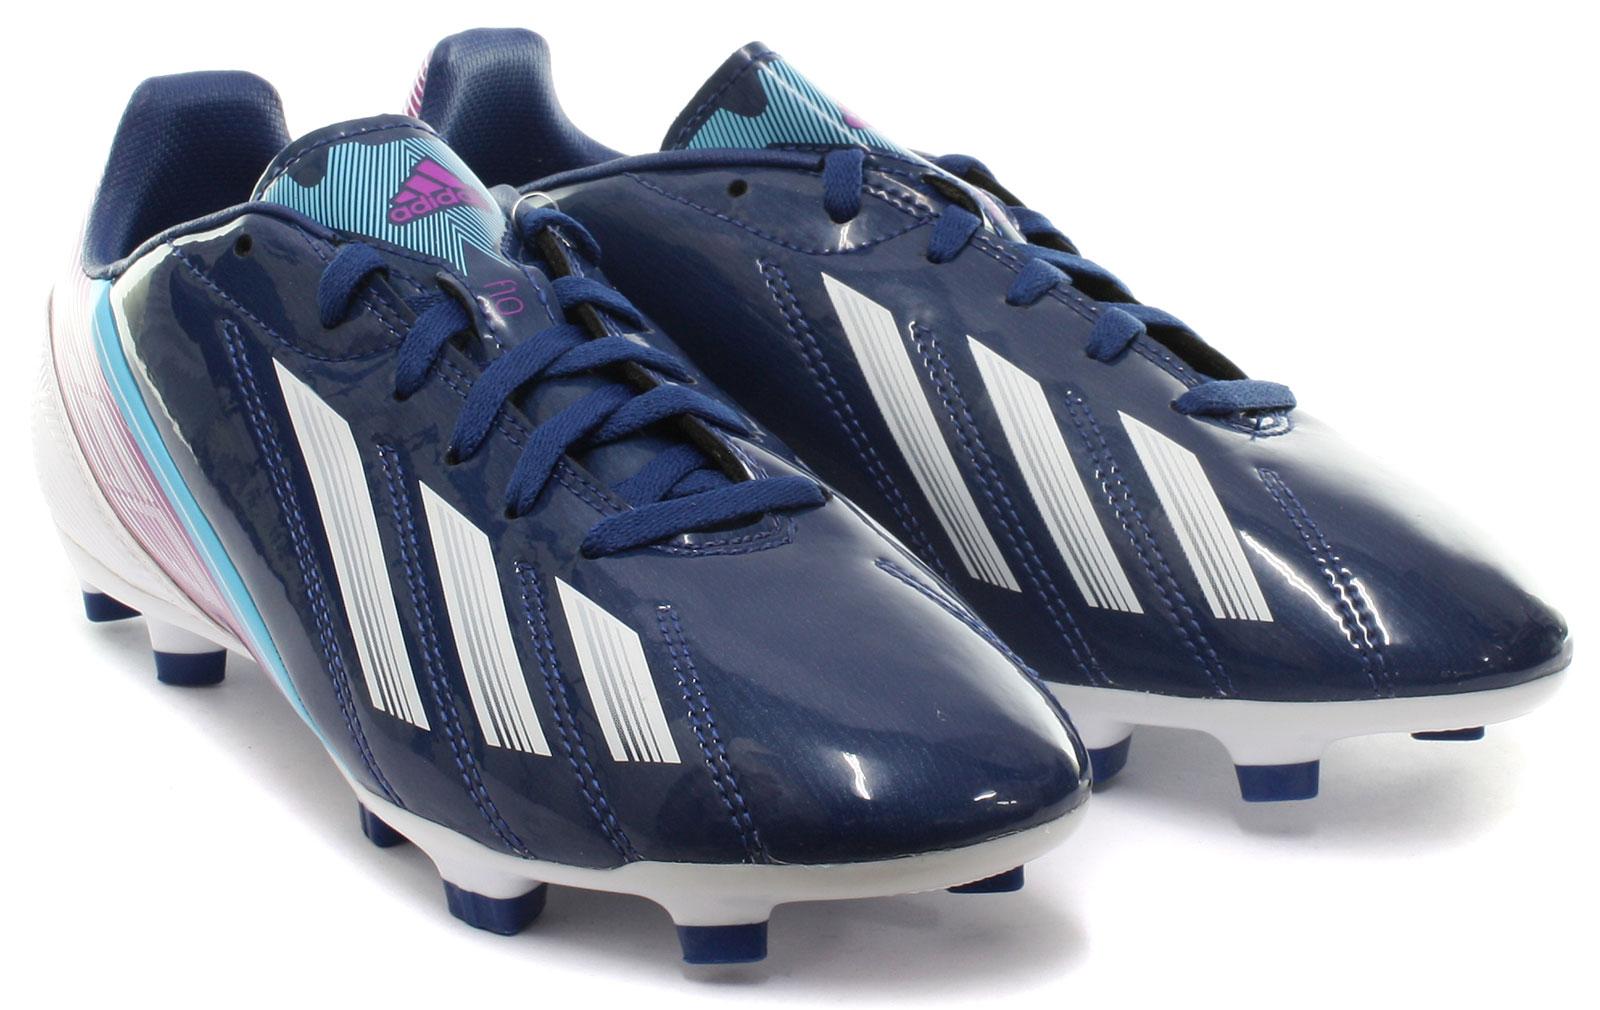 neu adidas F10 trx fg Junior Fußballschuhe alle Größen